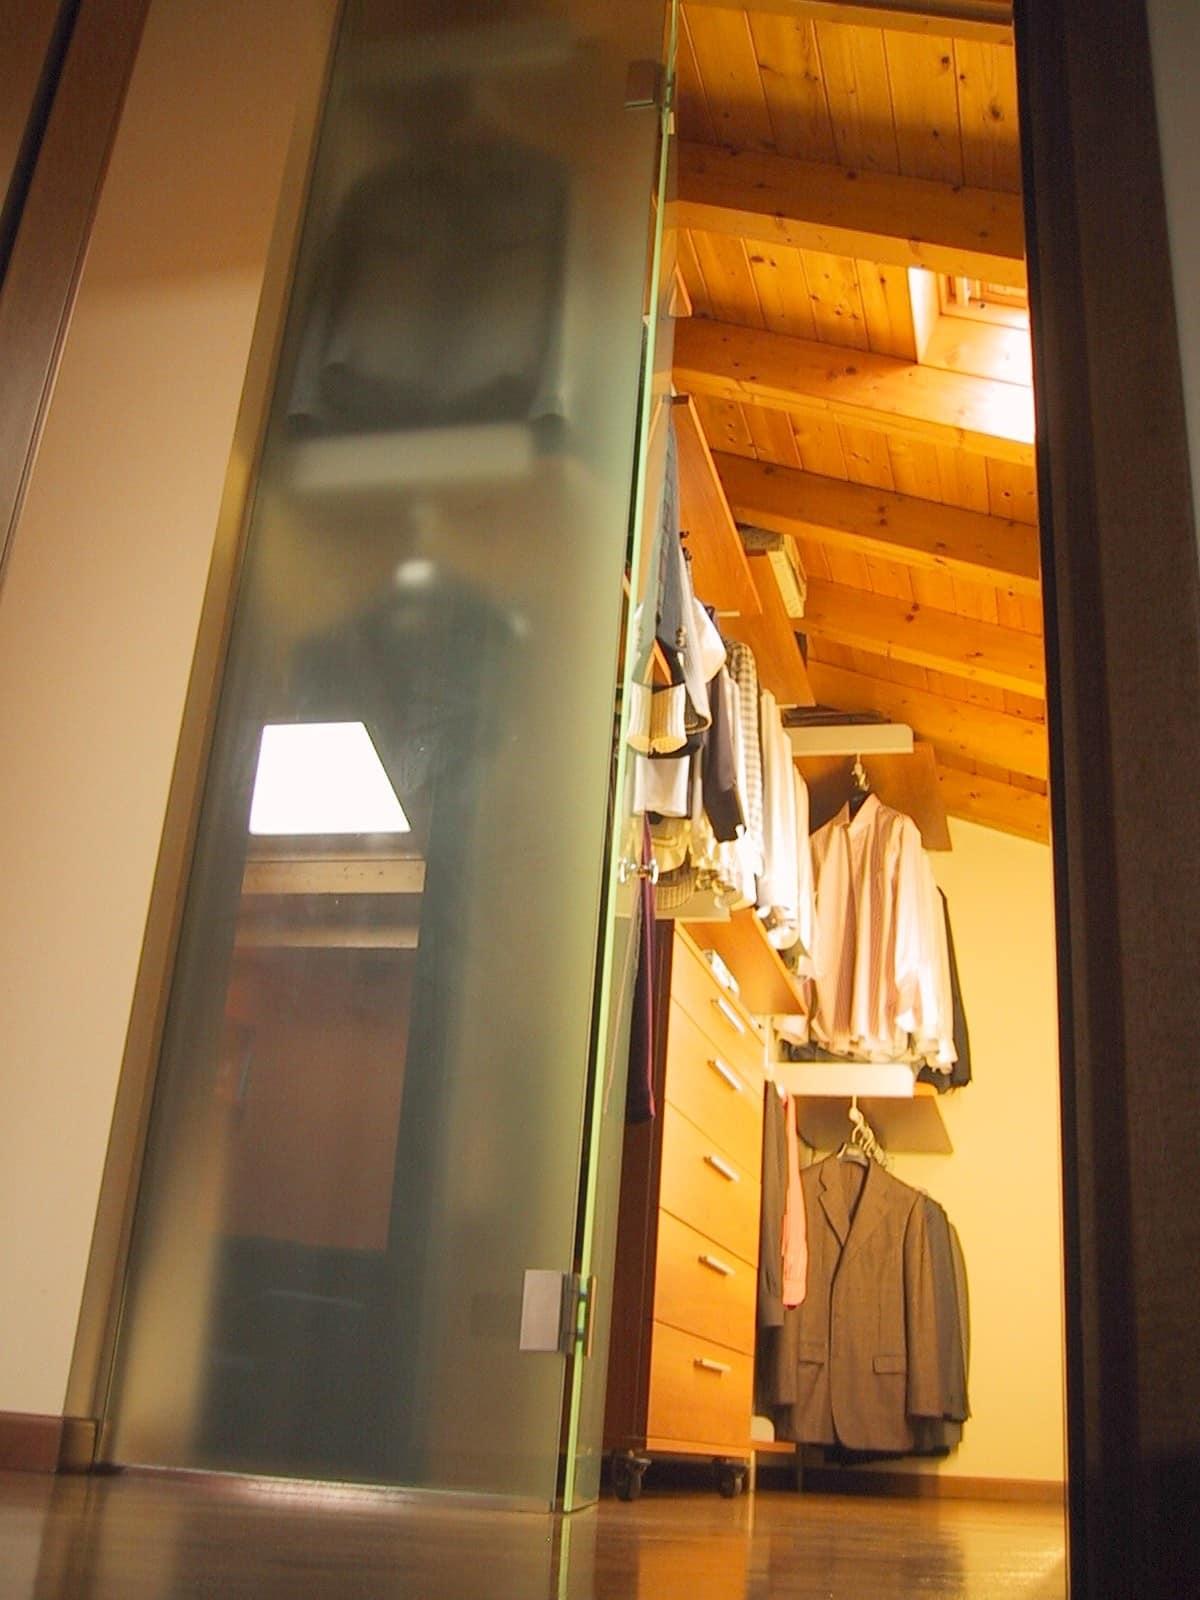 Armadiature Per Esterni cabina armadio con ante scorrevoli in vetro, per mansarda